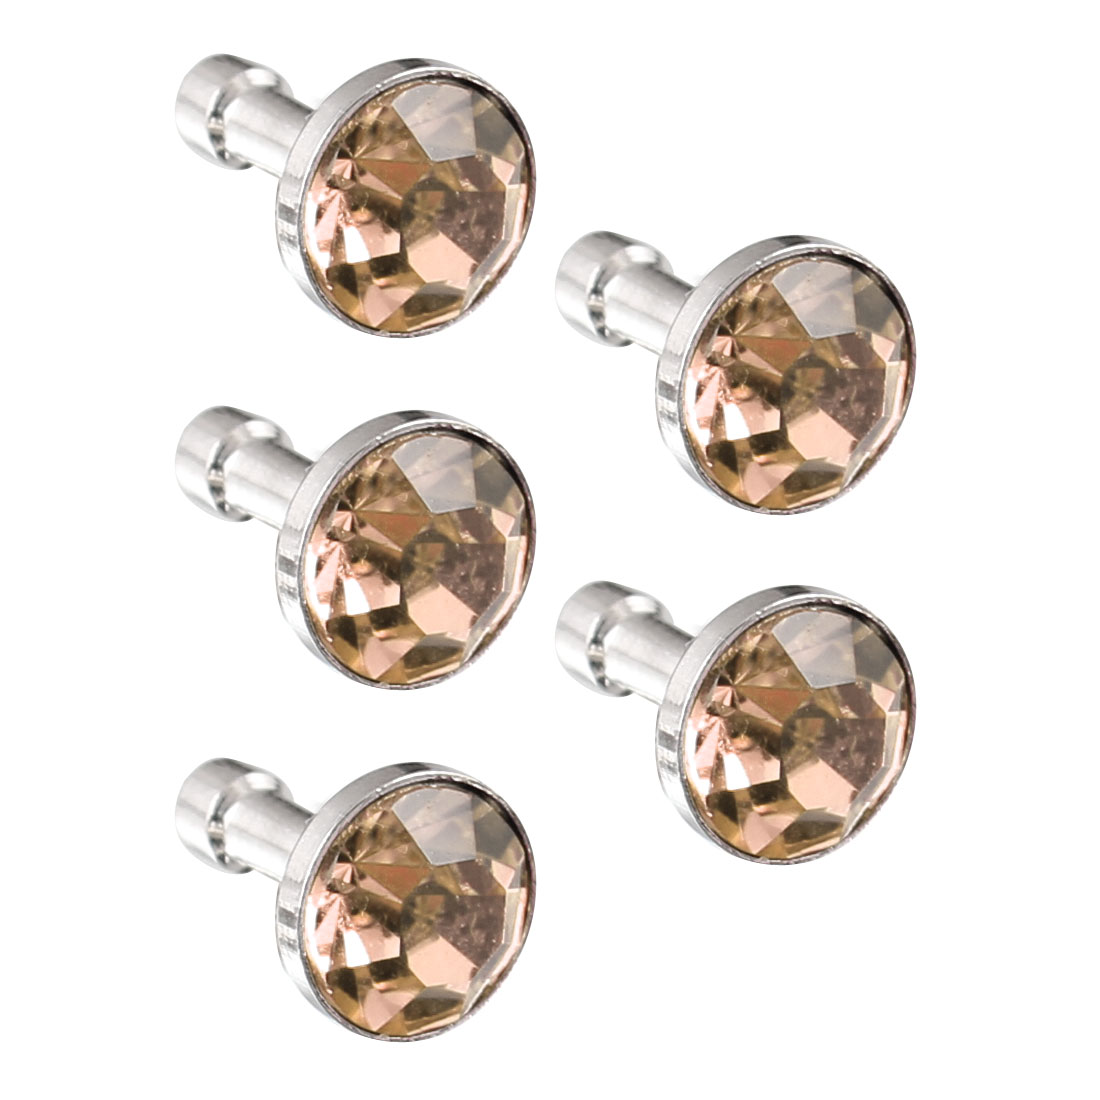 5Pcs Bling Pale Orange Crystal 3.5mm Earphone Jack Ear Cap Dust Plug for Smartphone